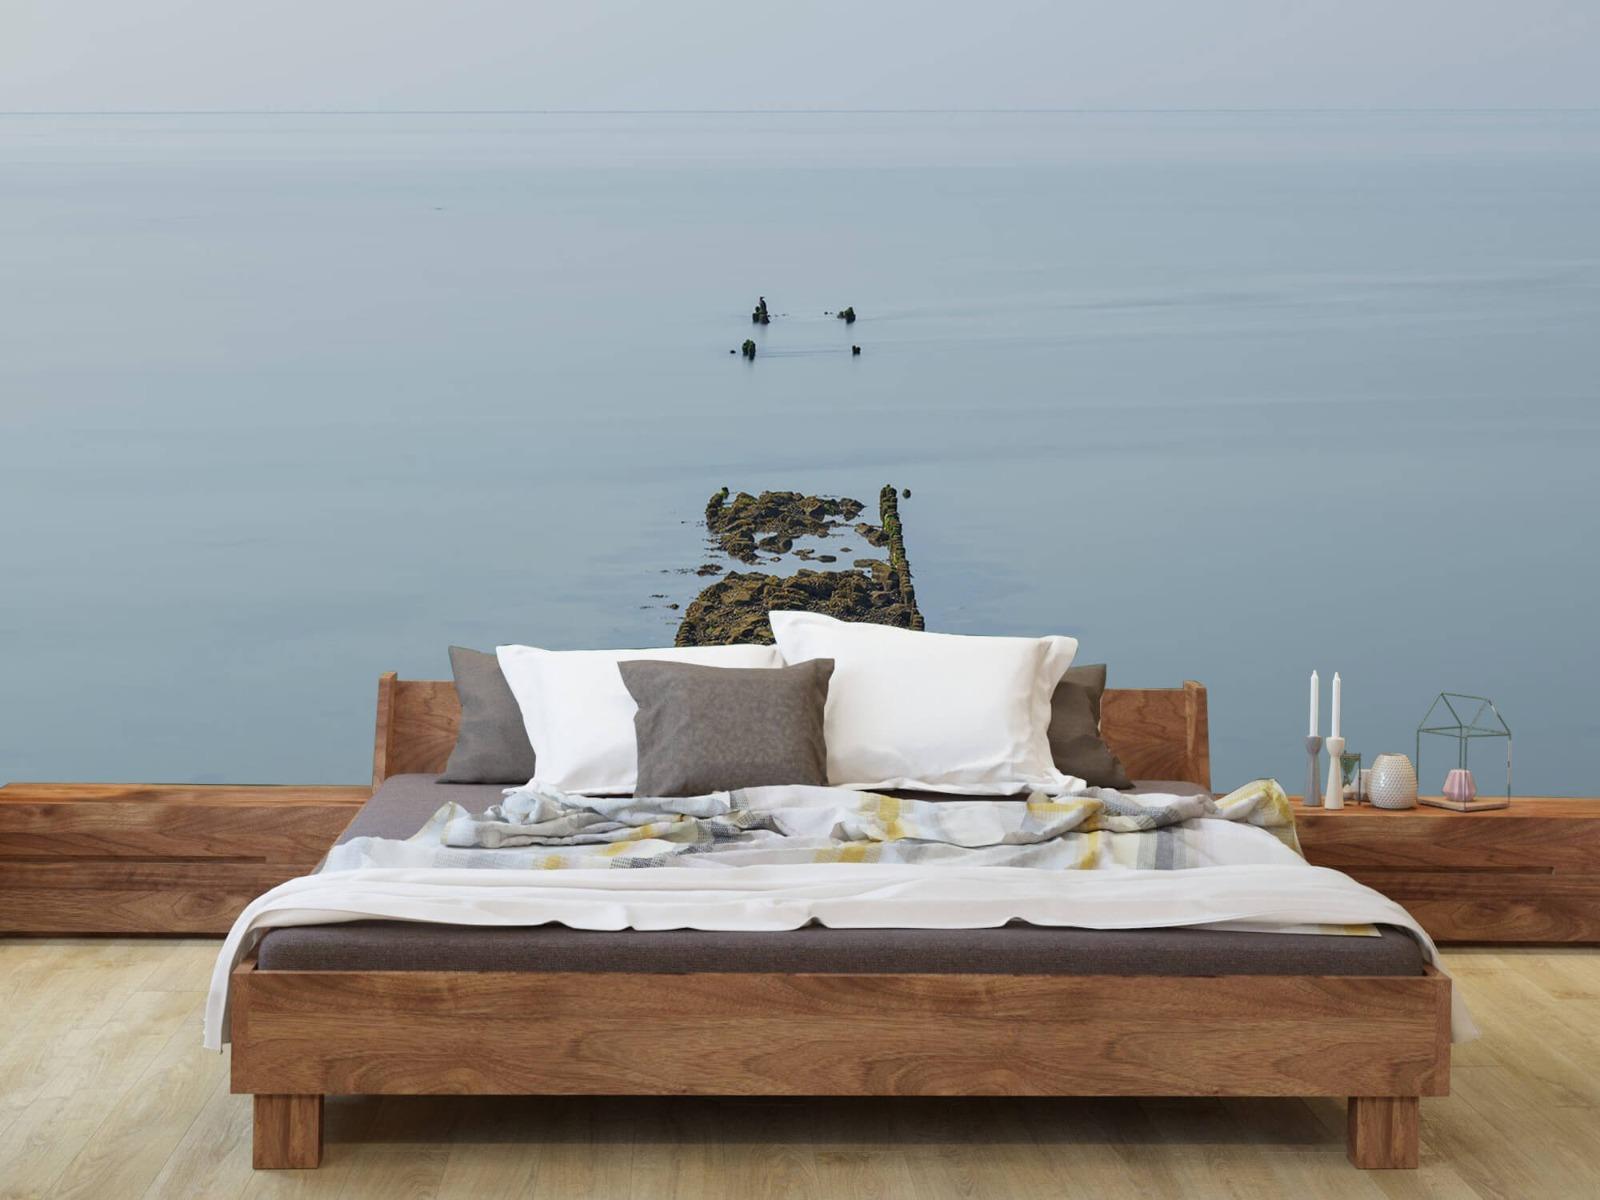 Zeeën en Oceanen - Golfbreker - Slaapkamer 7